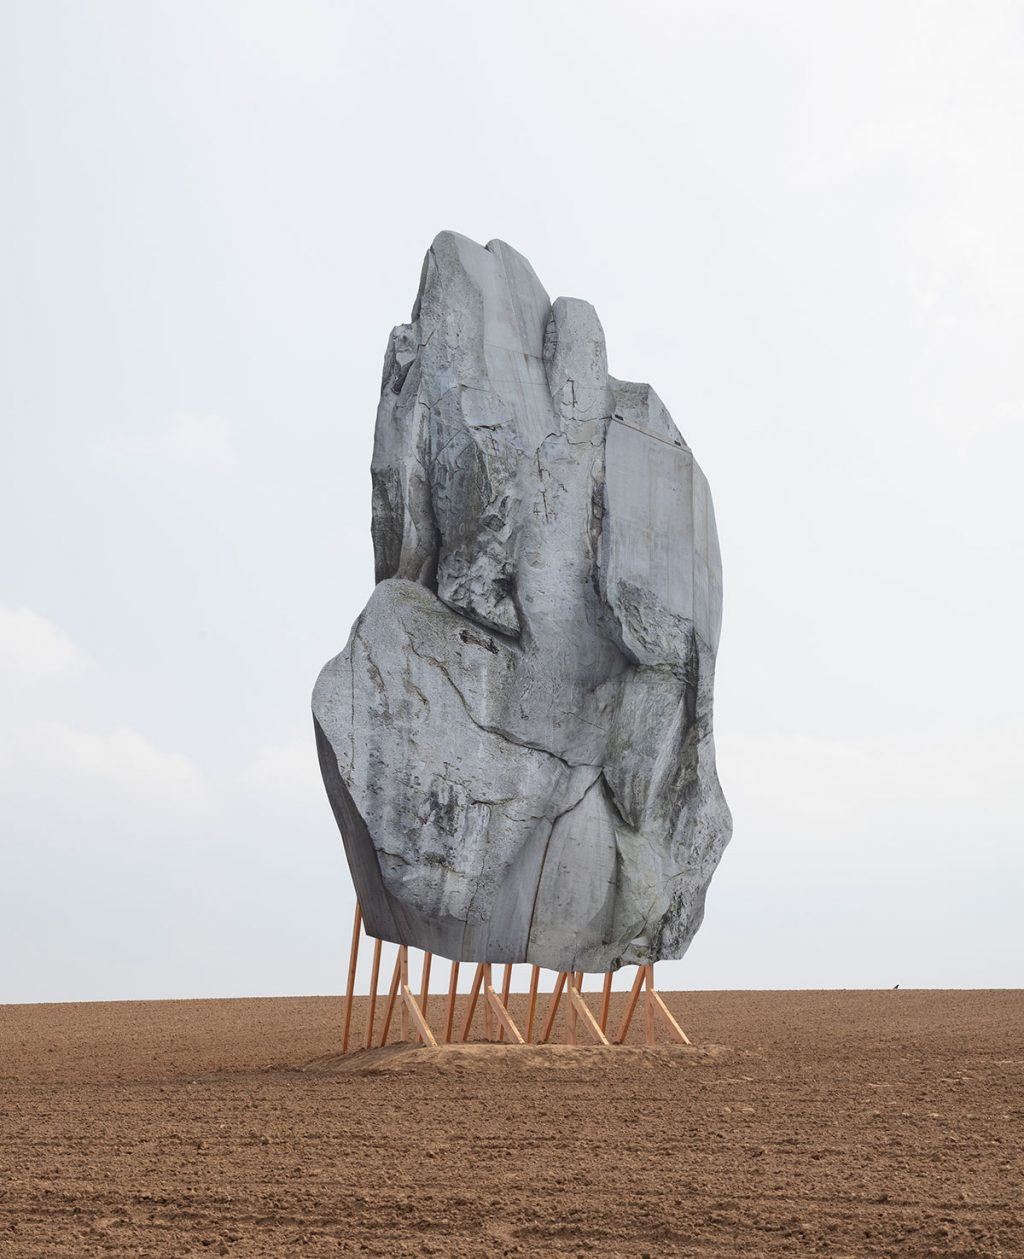 Gijs van Vaerenbergh, 'Windmill'. Photo: Michiel De Cleene